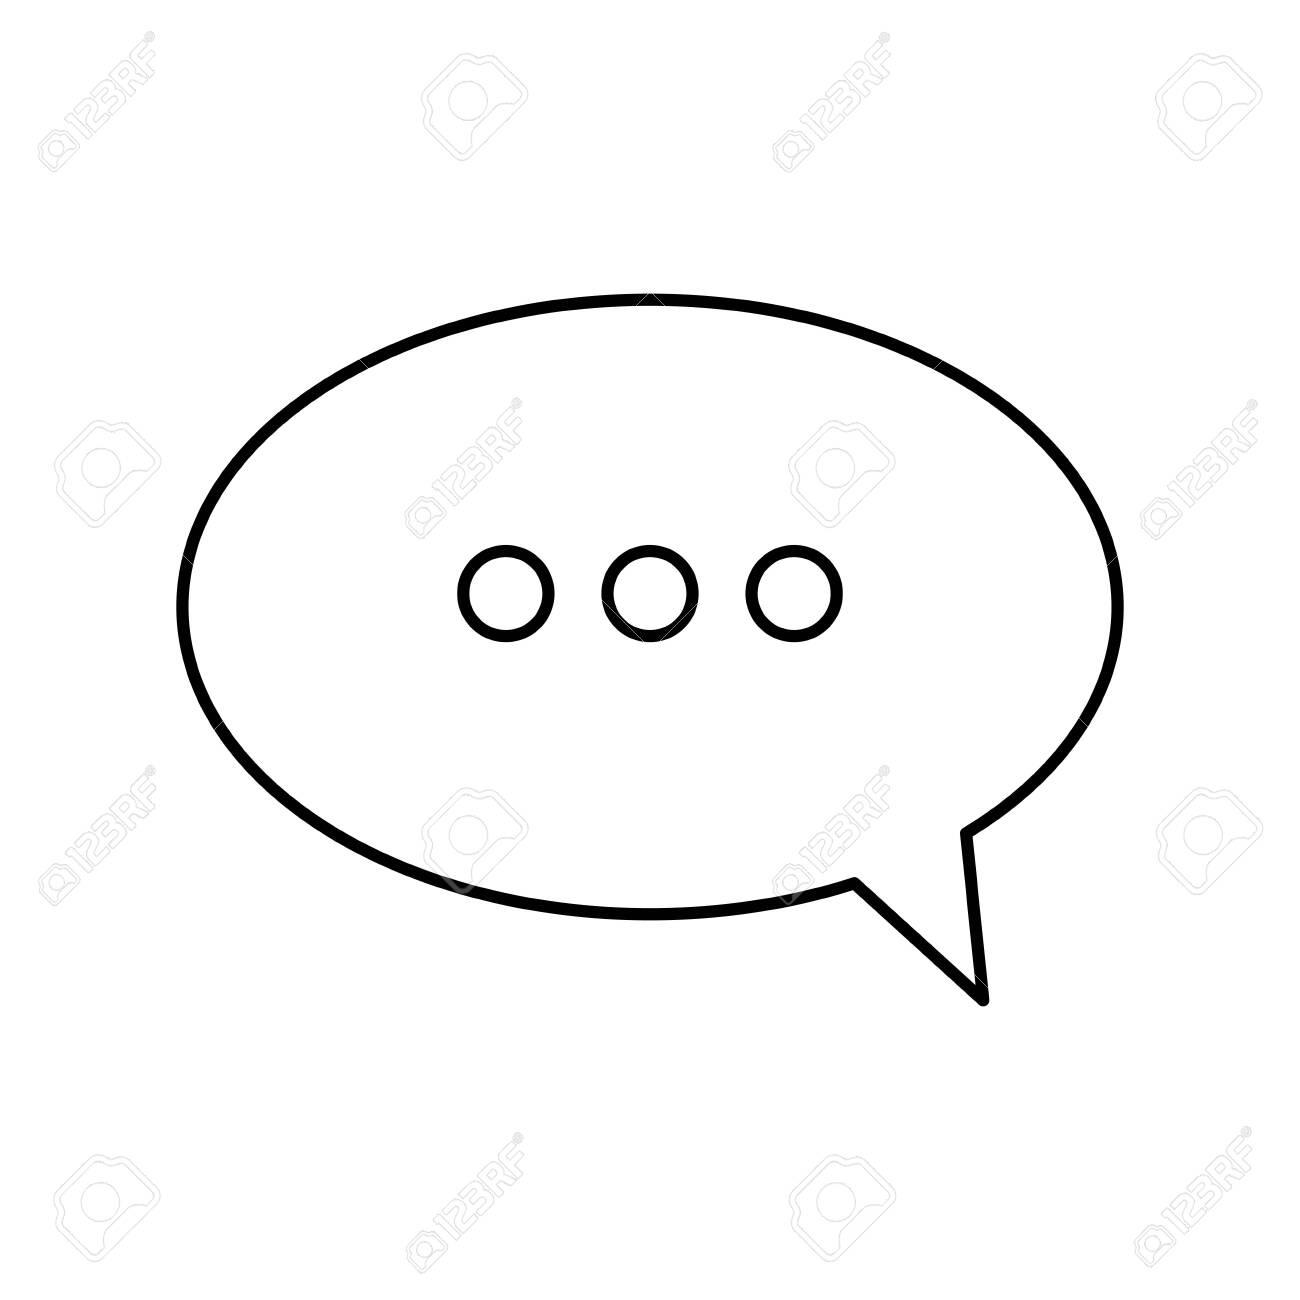 speech bubble line style icon vector illustration design - 135694412